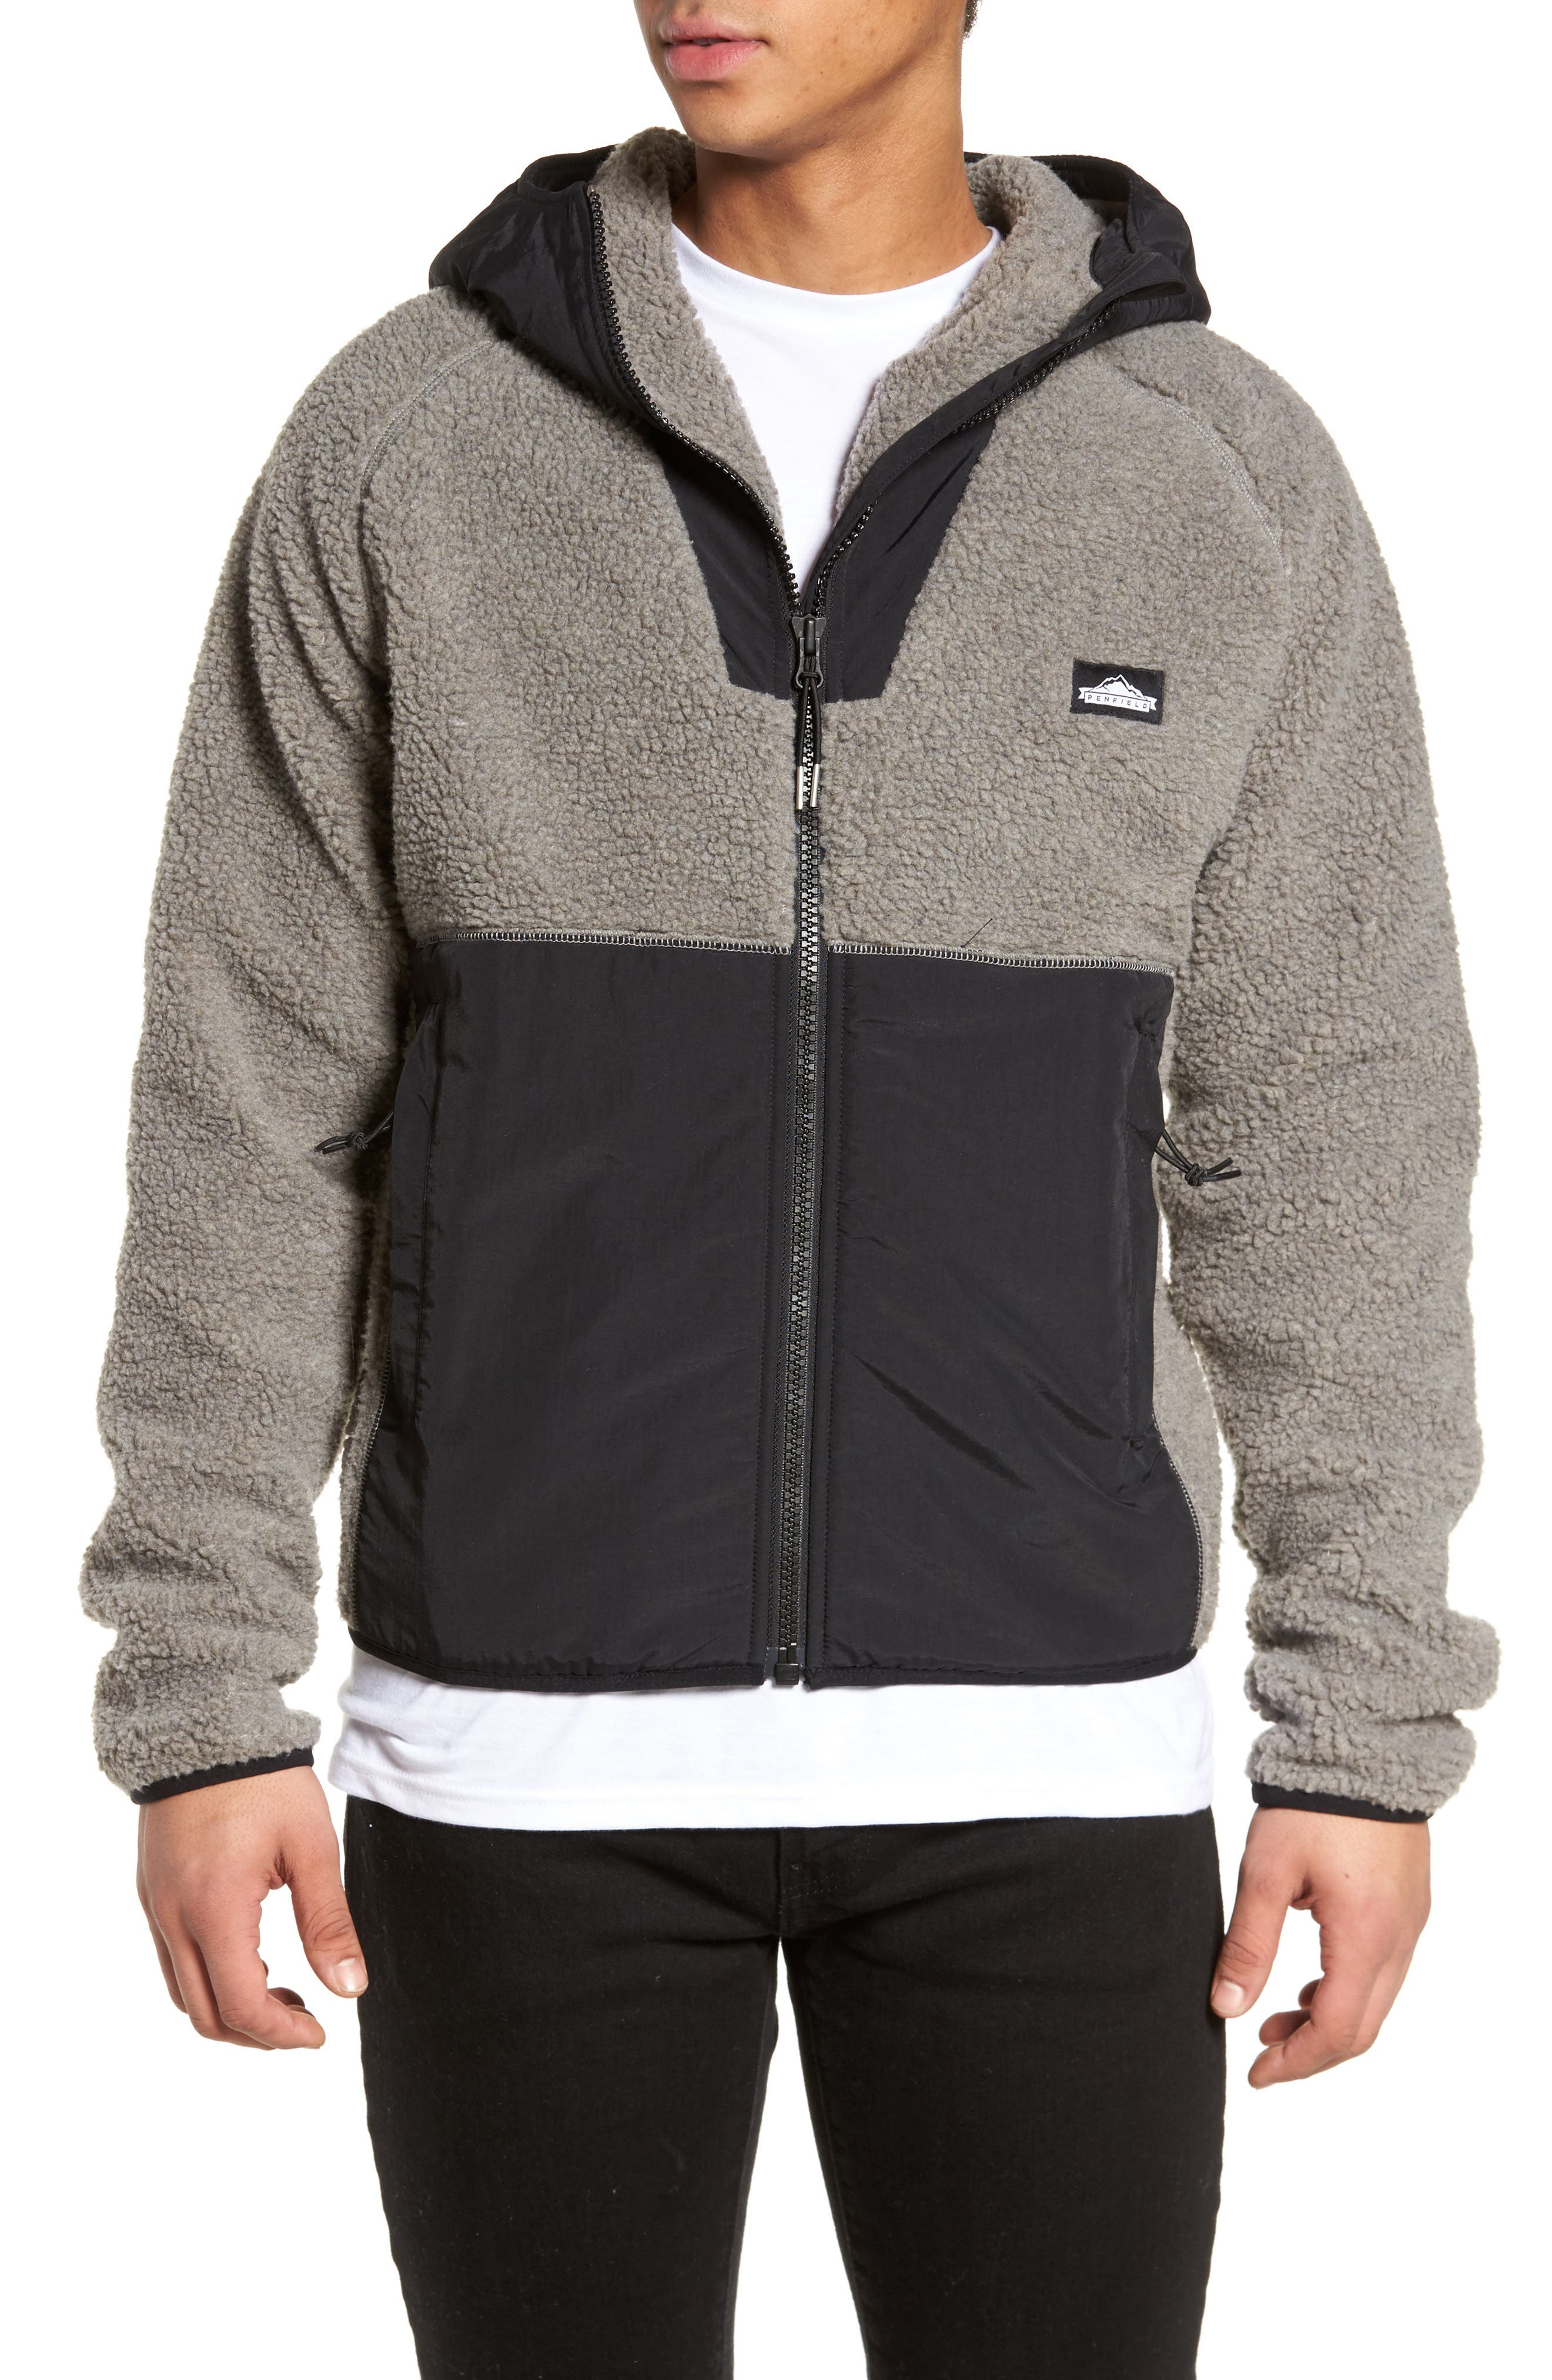 Vaughn Hooded Fleece Jacket,                             Main thumbnail 1, color,                             Grey